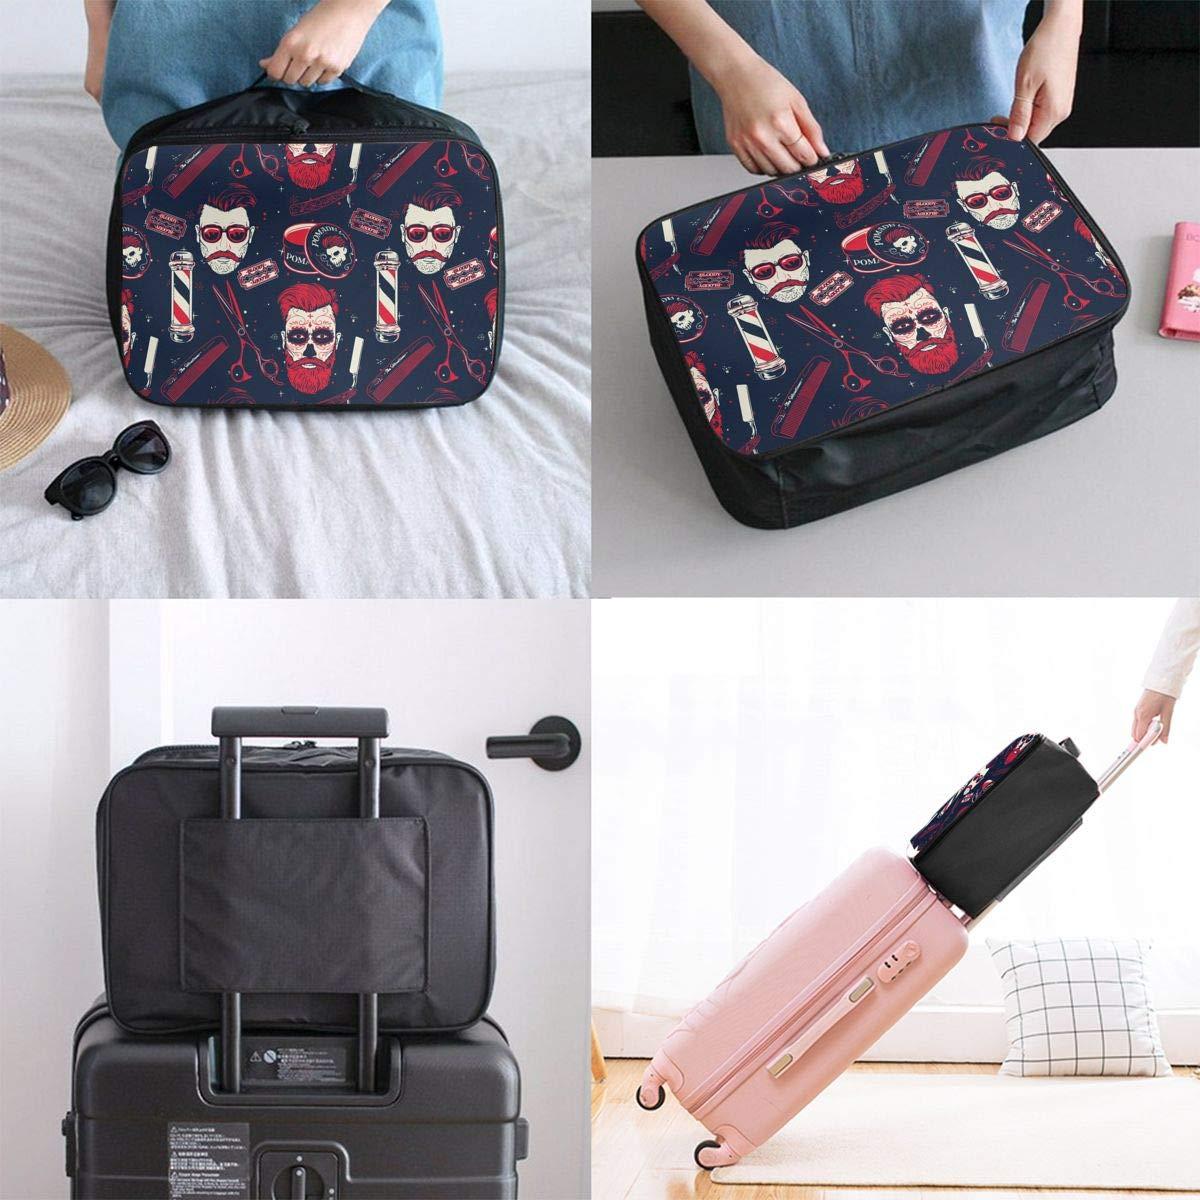 Vintage Barber Shop Tools Travel Duffel Bag Waterproof Fashion Lightweight Large Capacity Portable Luggage Bag